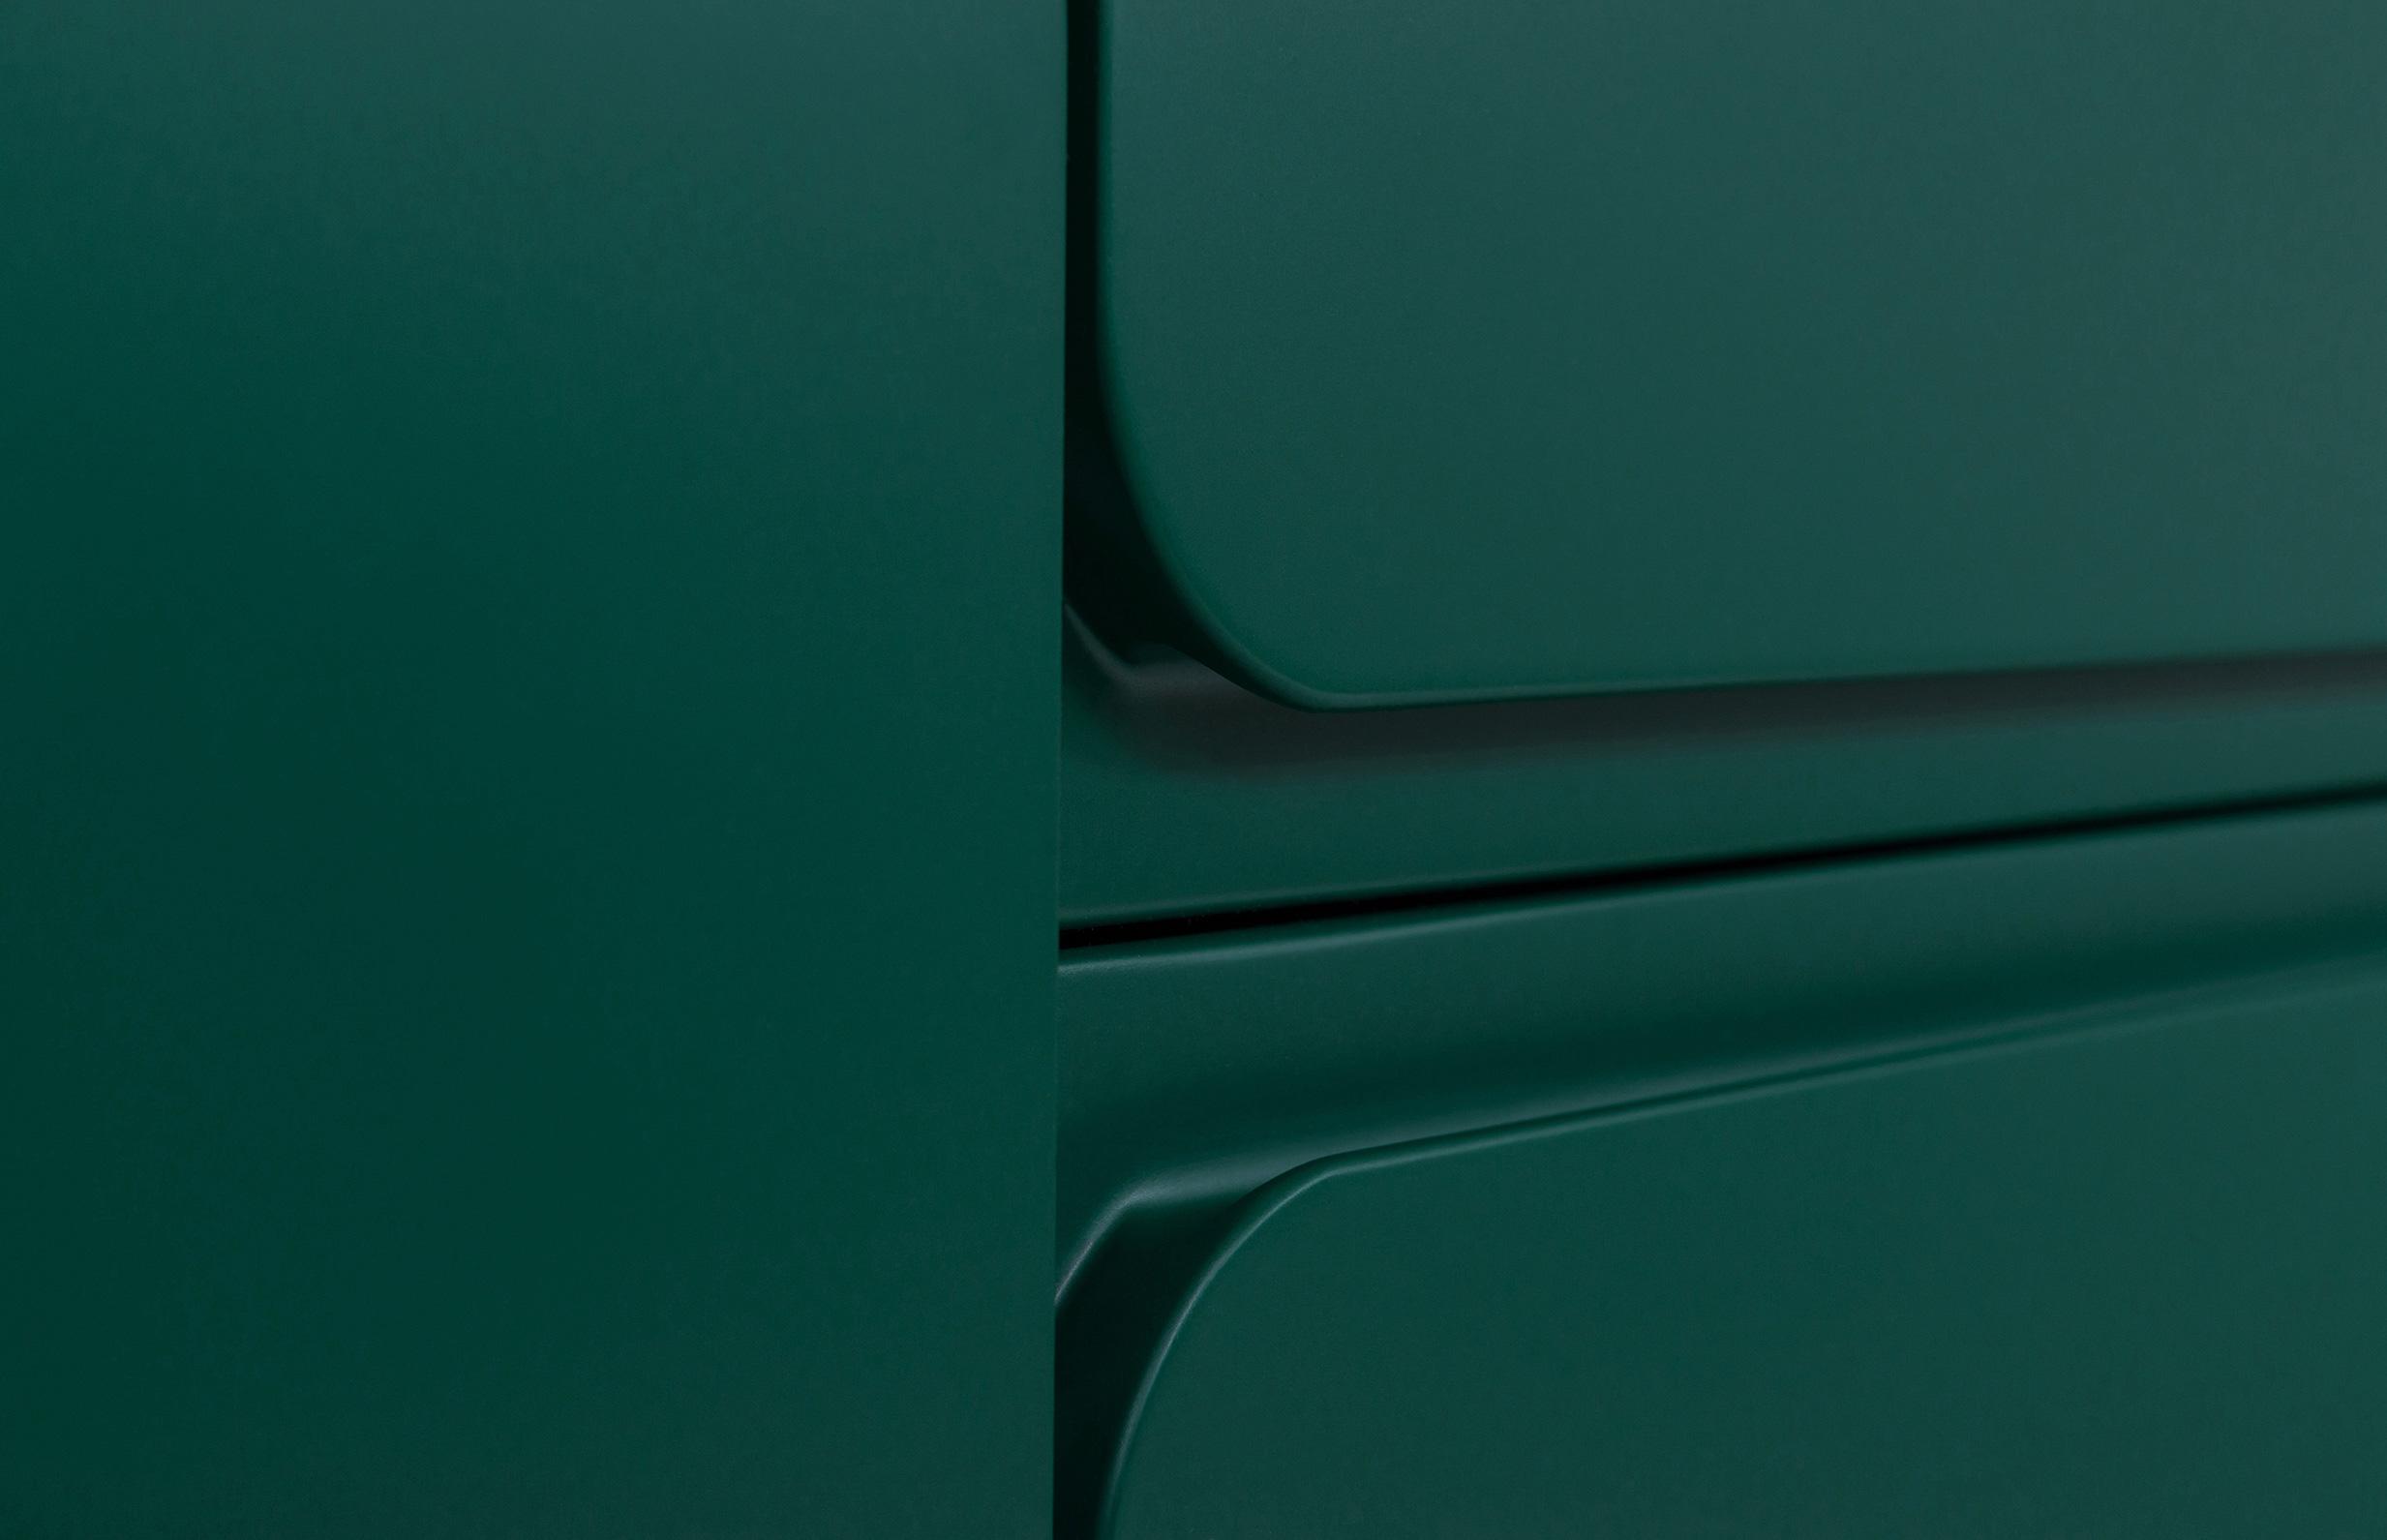 P4_ciemna-zielen_detal-_poprawa